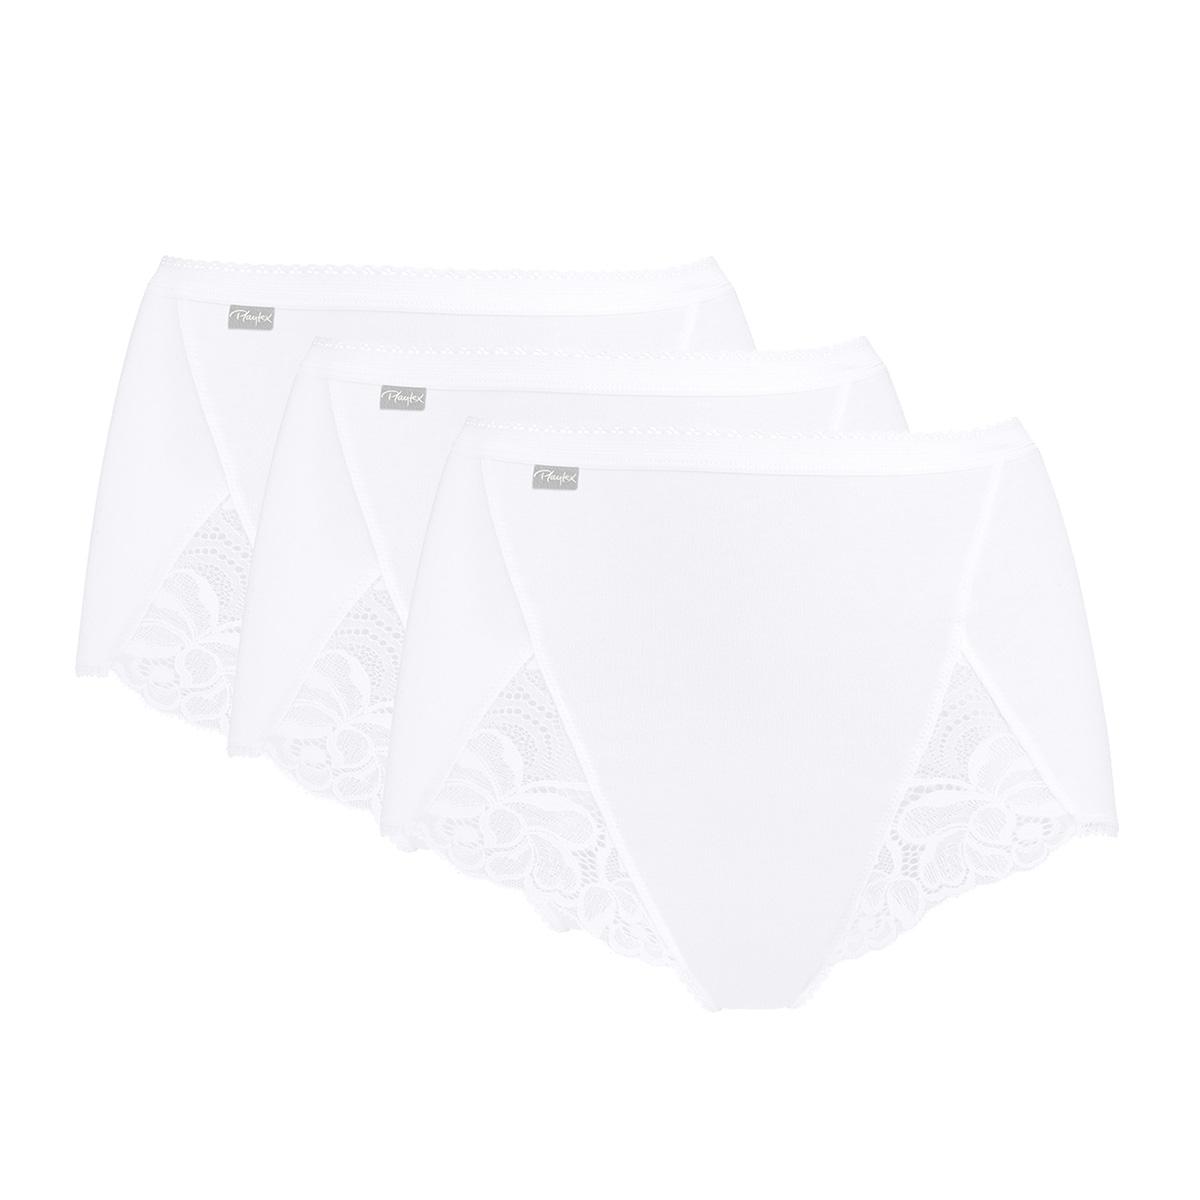 3 Culottes Maxi blanches – Coton & Dentelle, , PLAYTEX